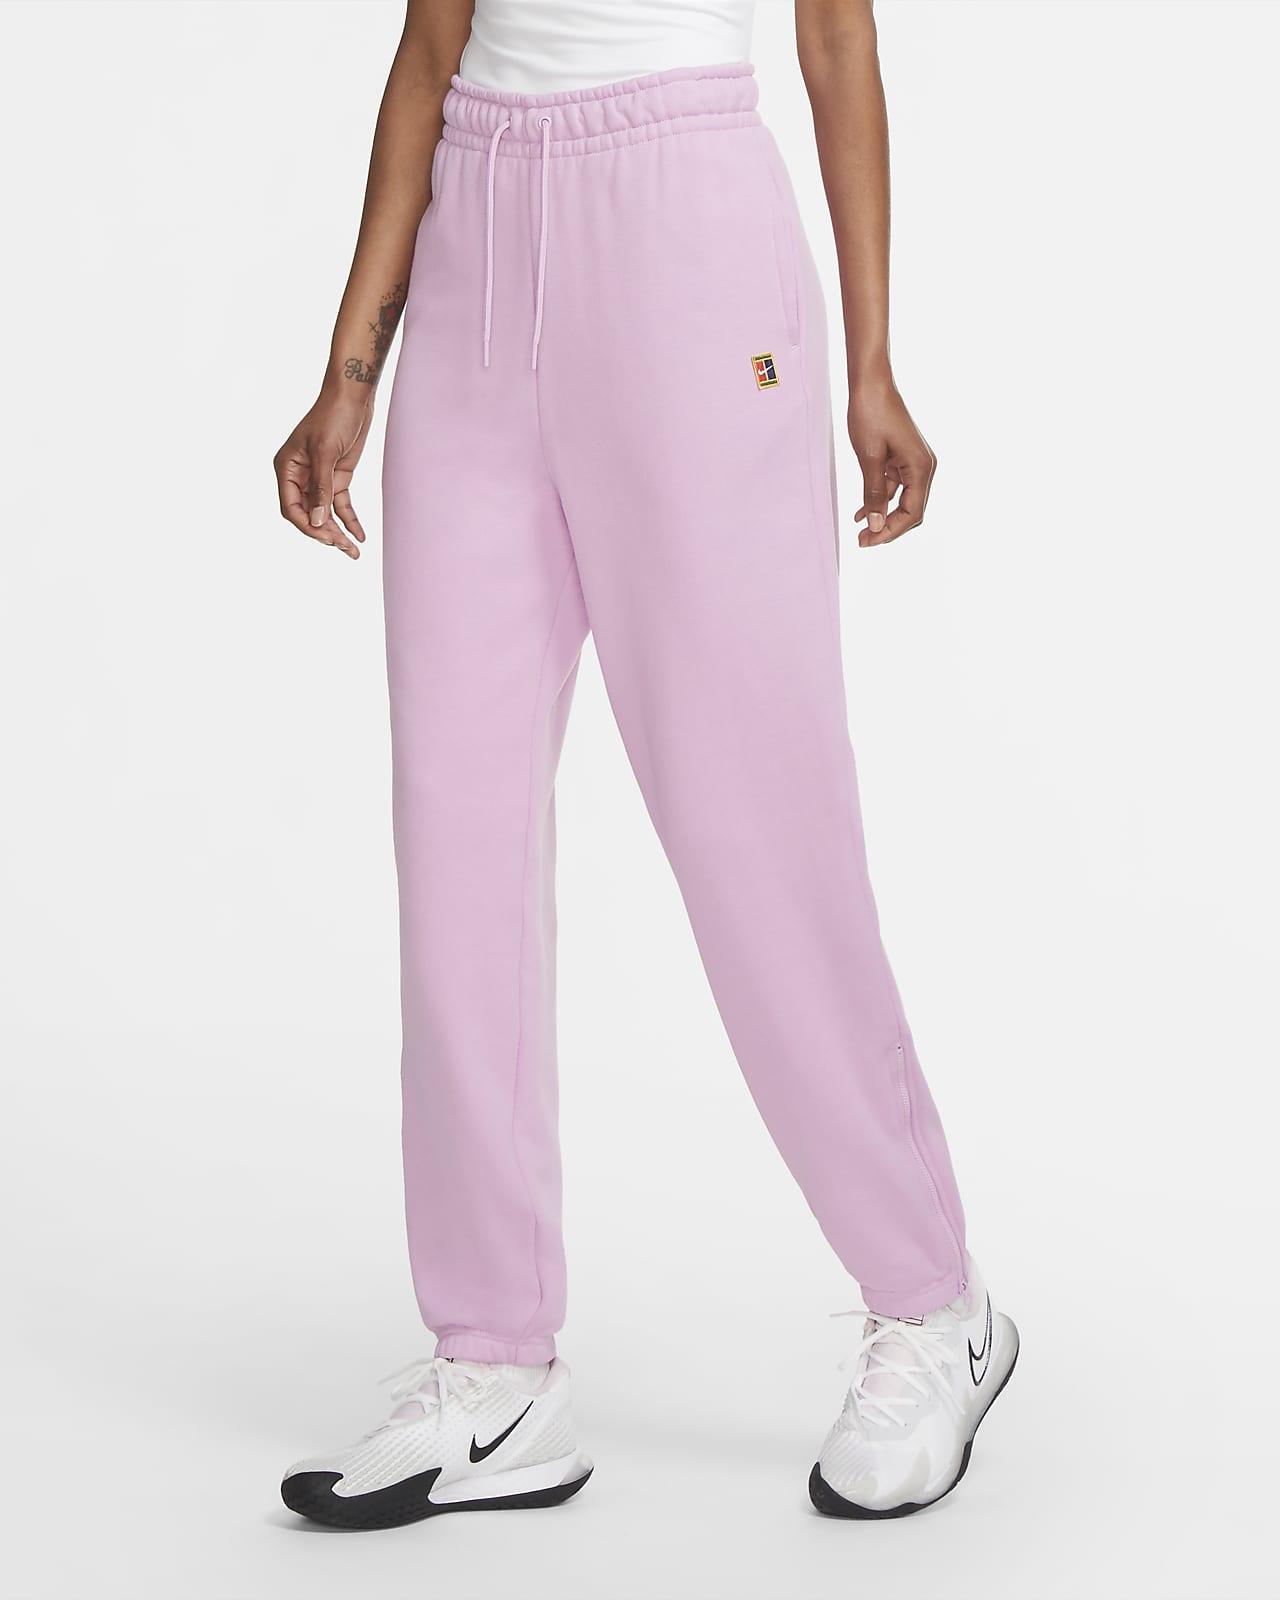 NikeCourt 女款網球長褲